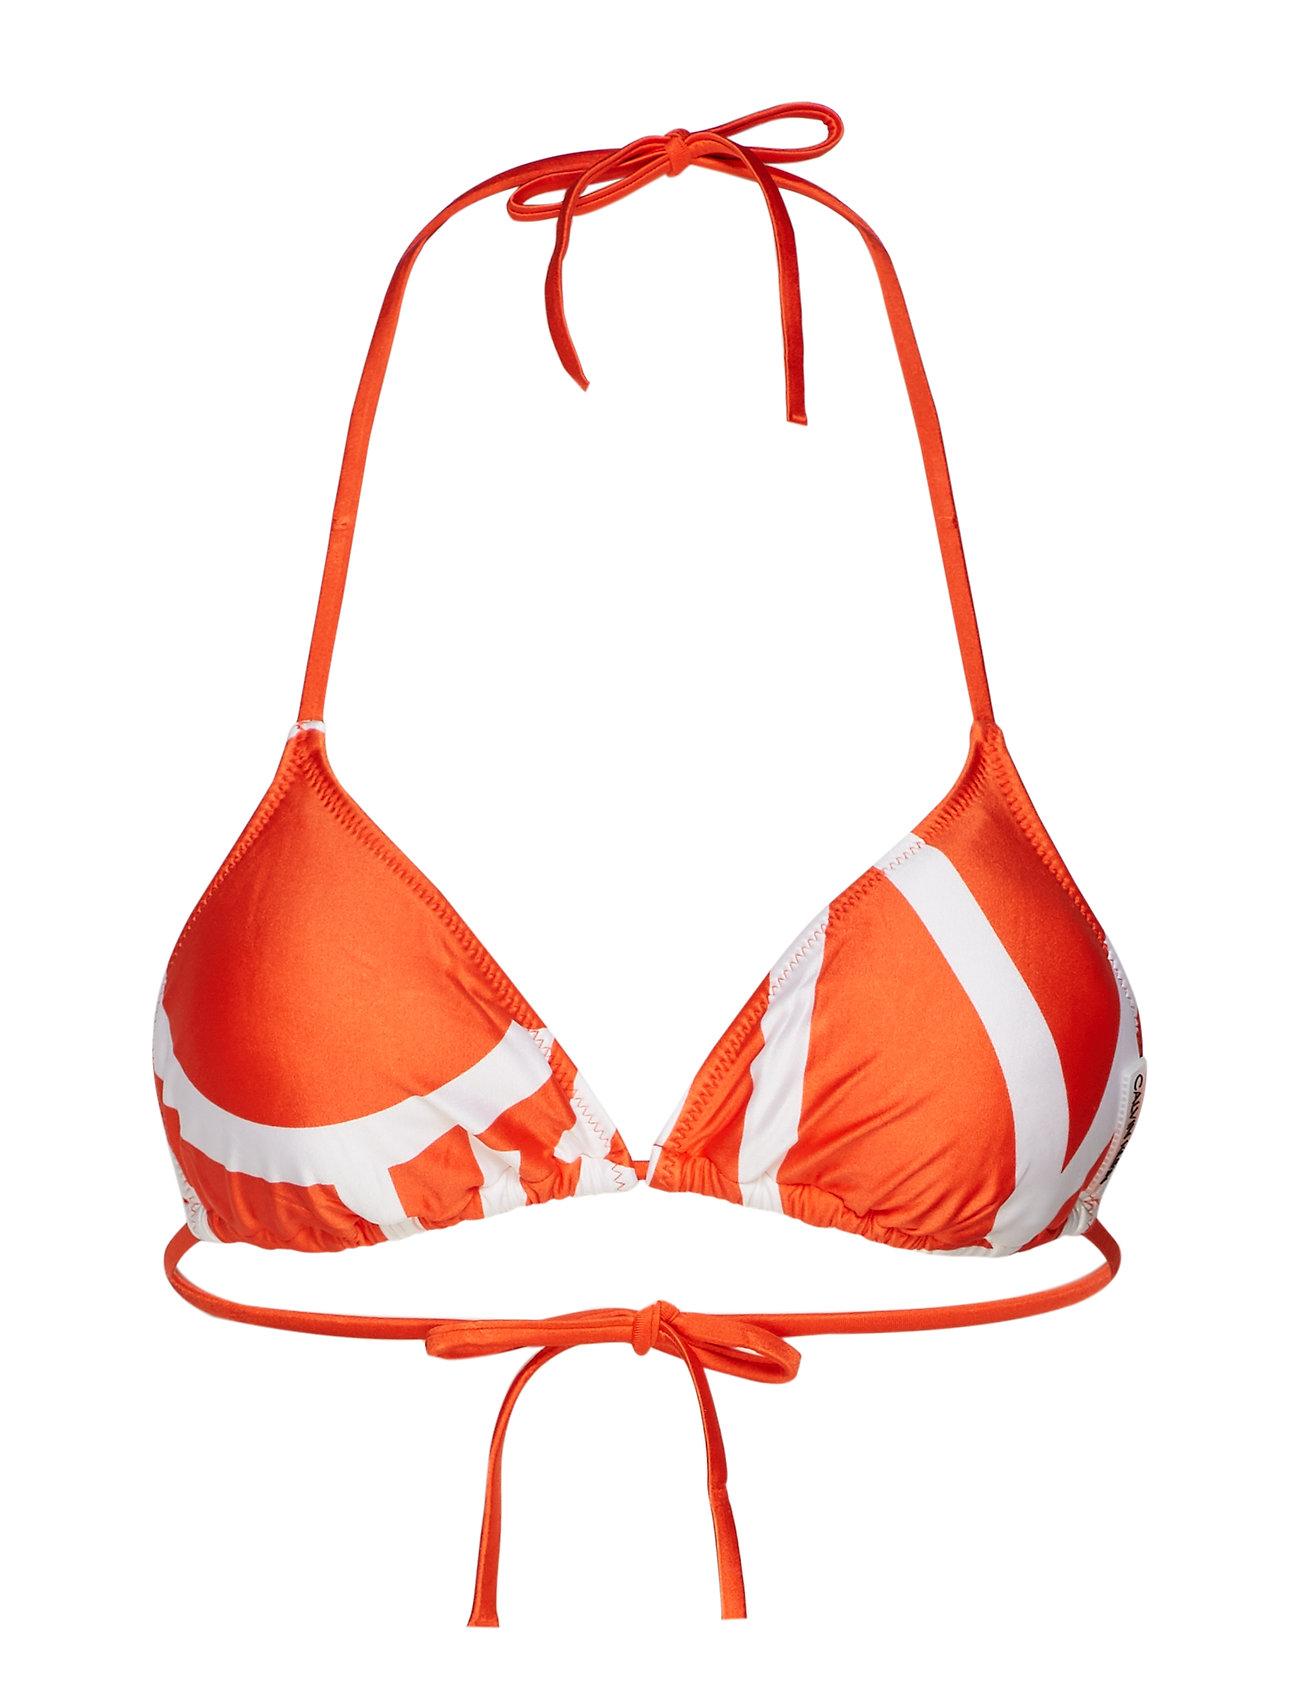 Calvin Klein TRIANGLE-RP - KLEIN ABSTRACT MANDARIN RED